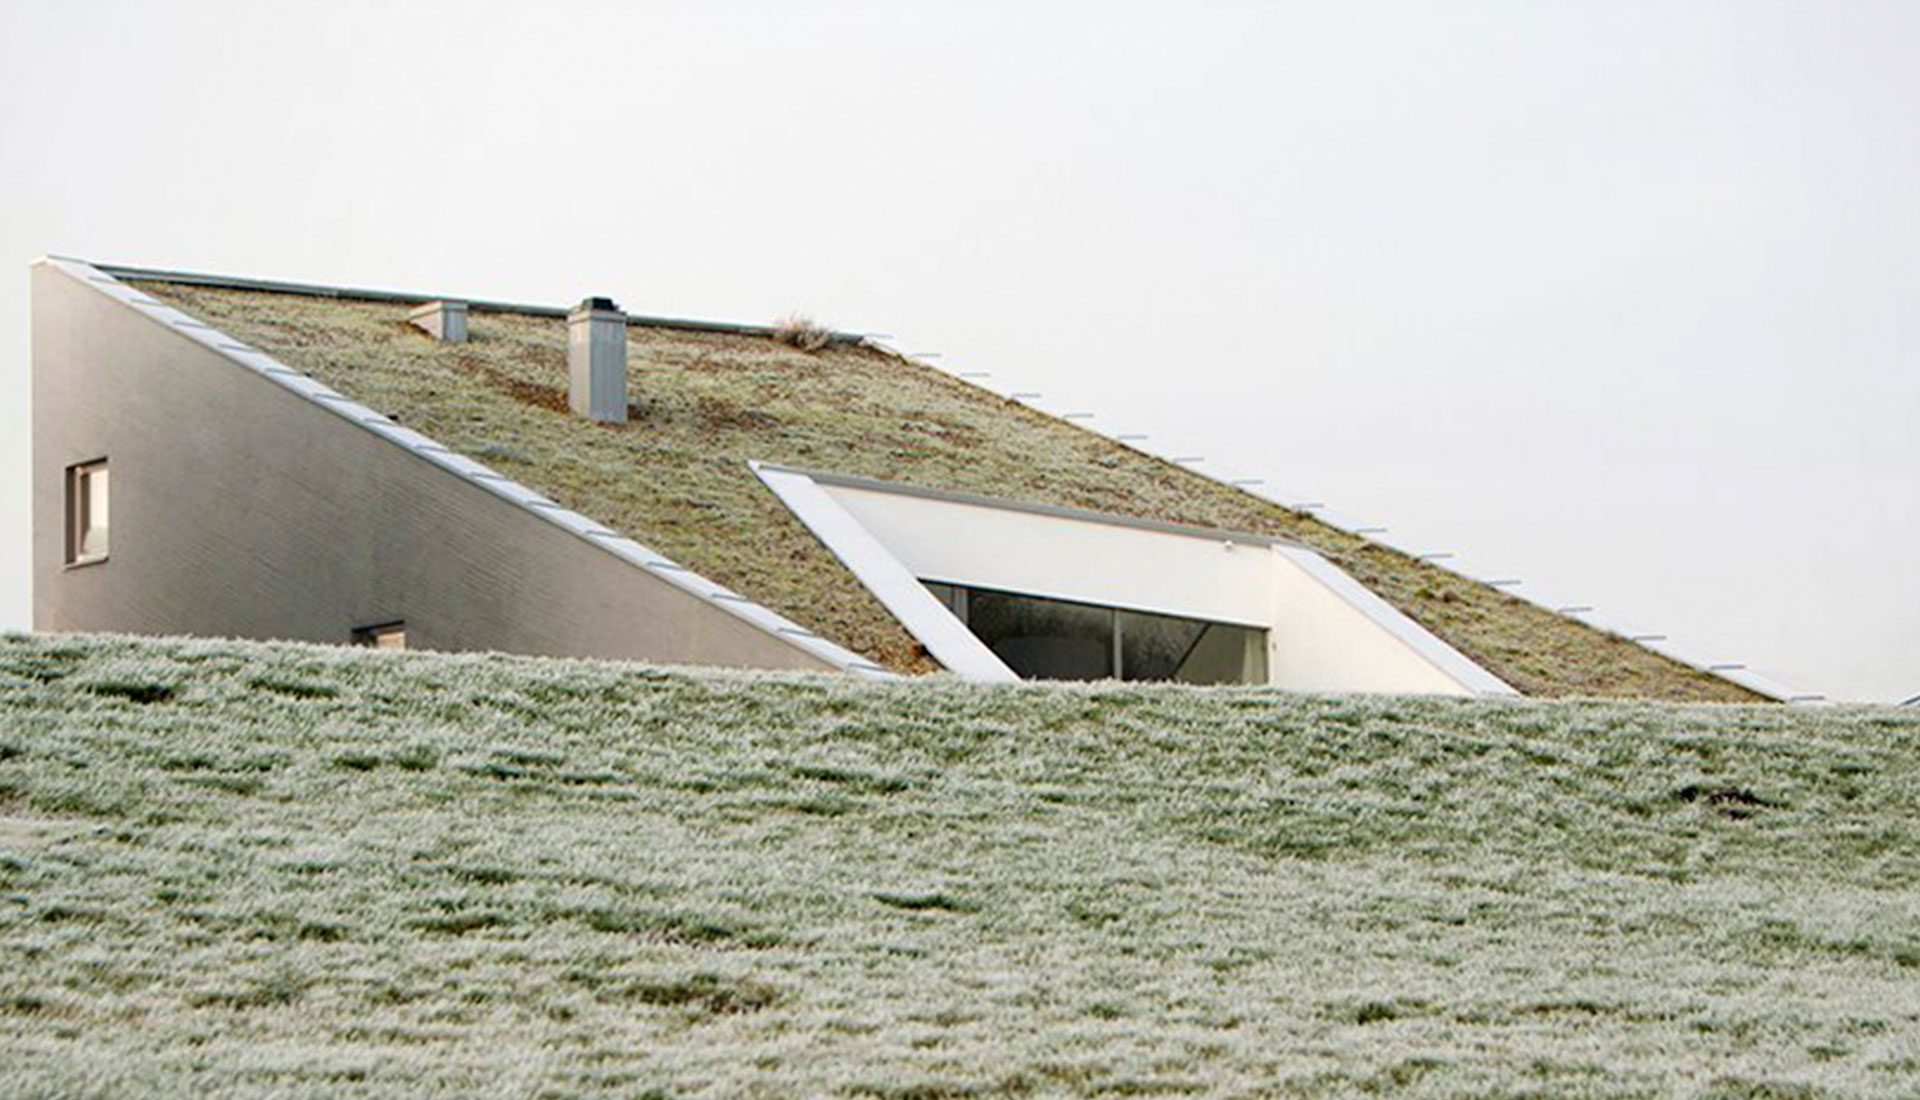 After Party: дом в Литве с зеленой крышей